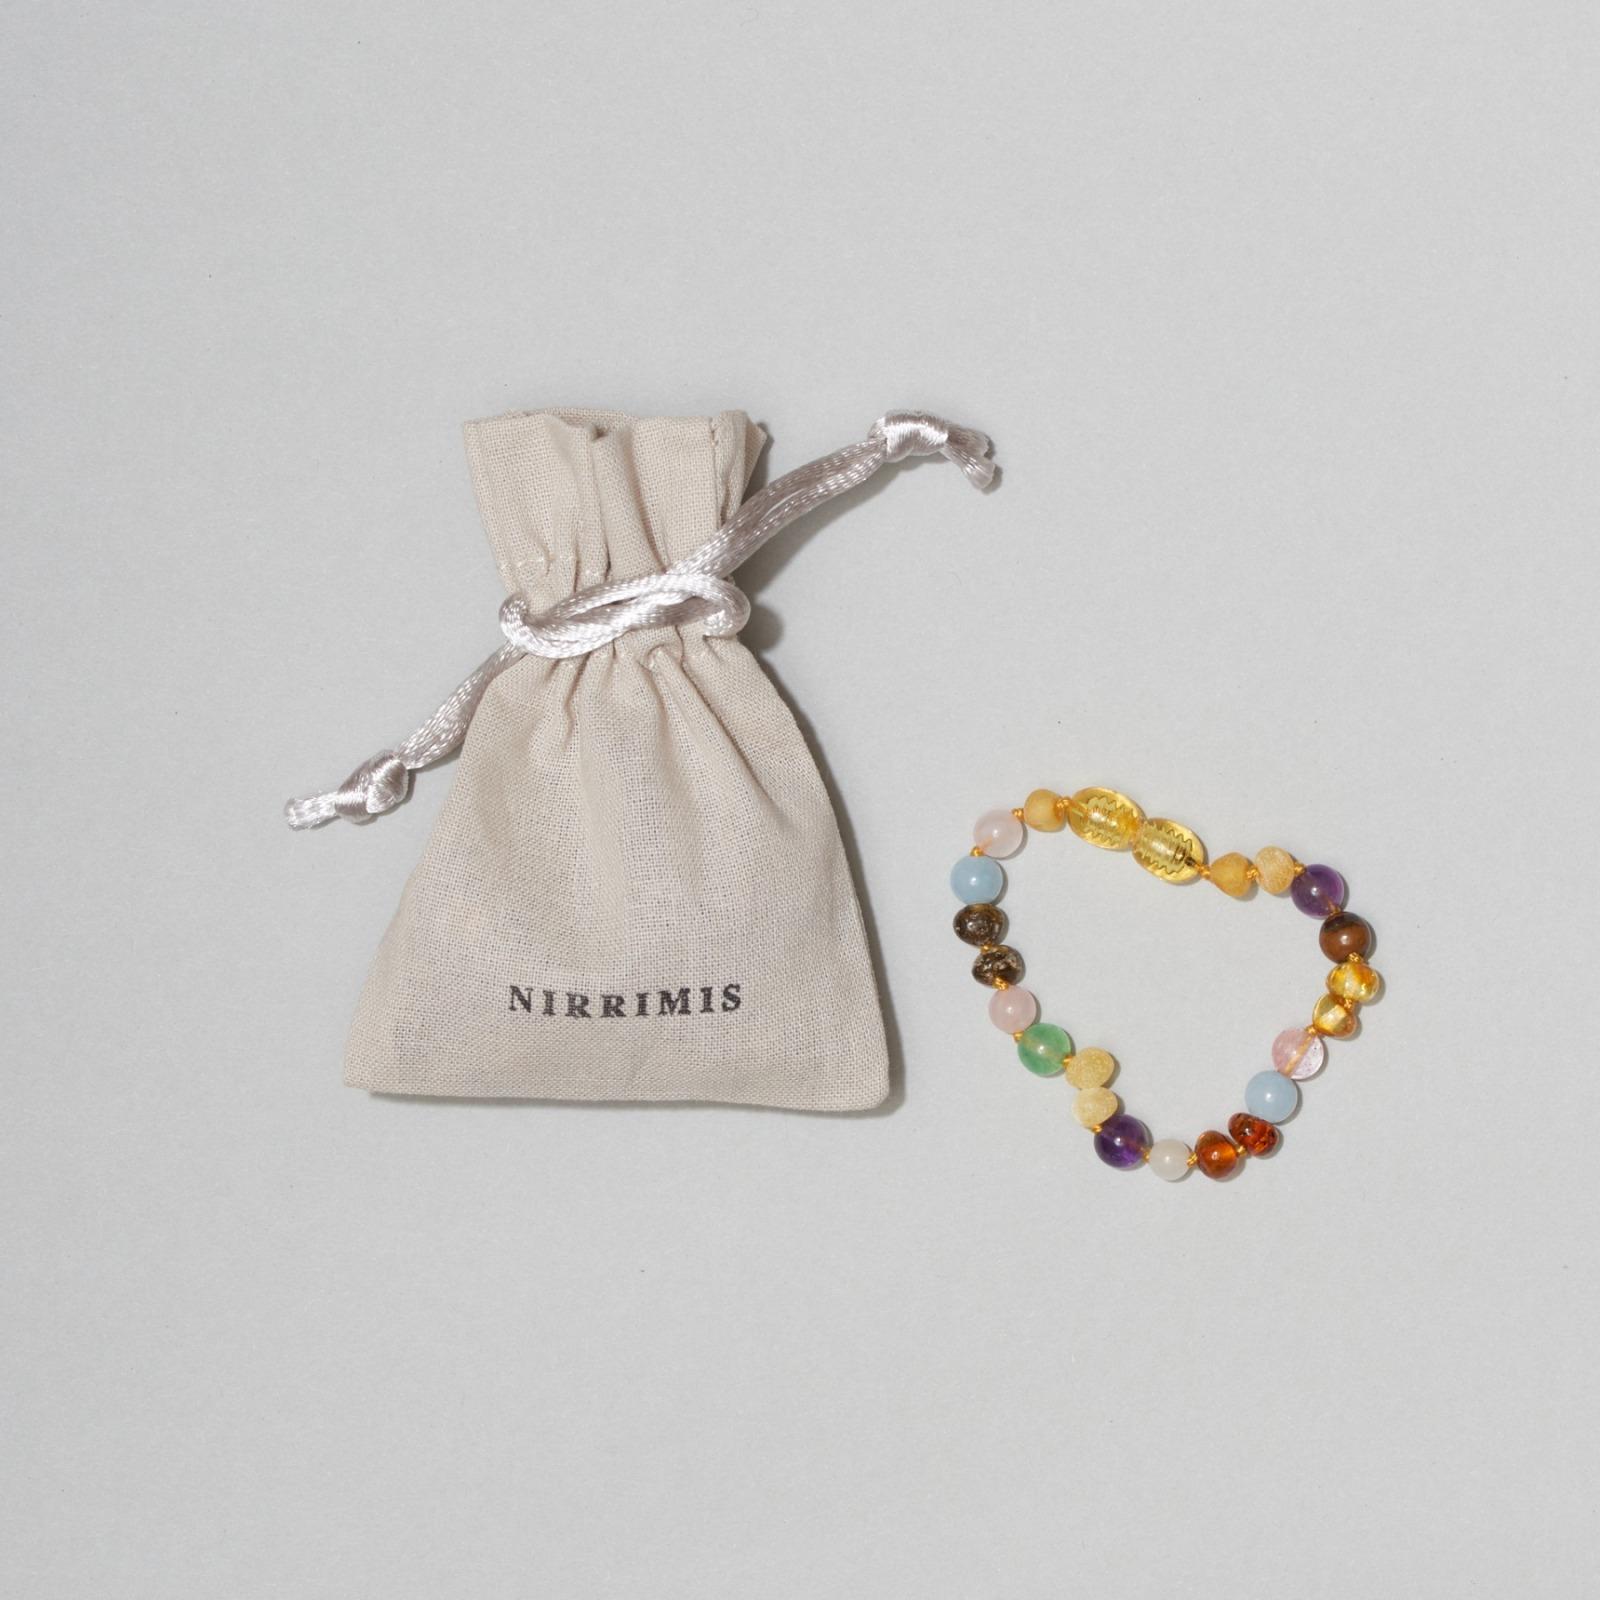 Nirrimis Armband Regenbogen